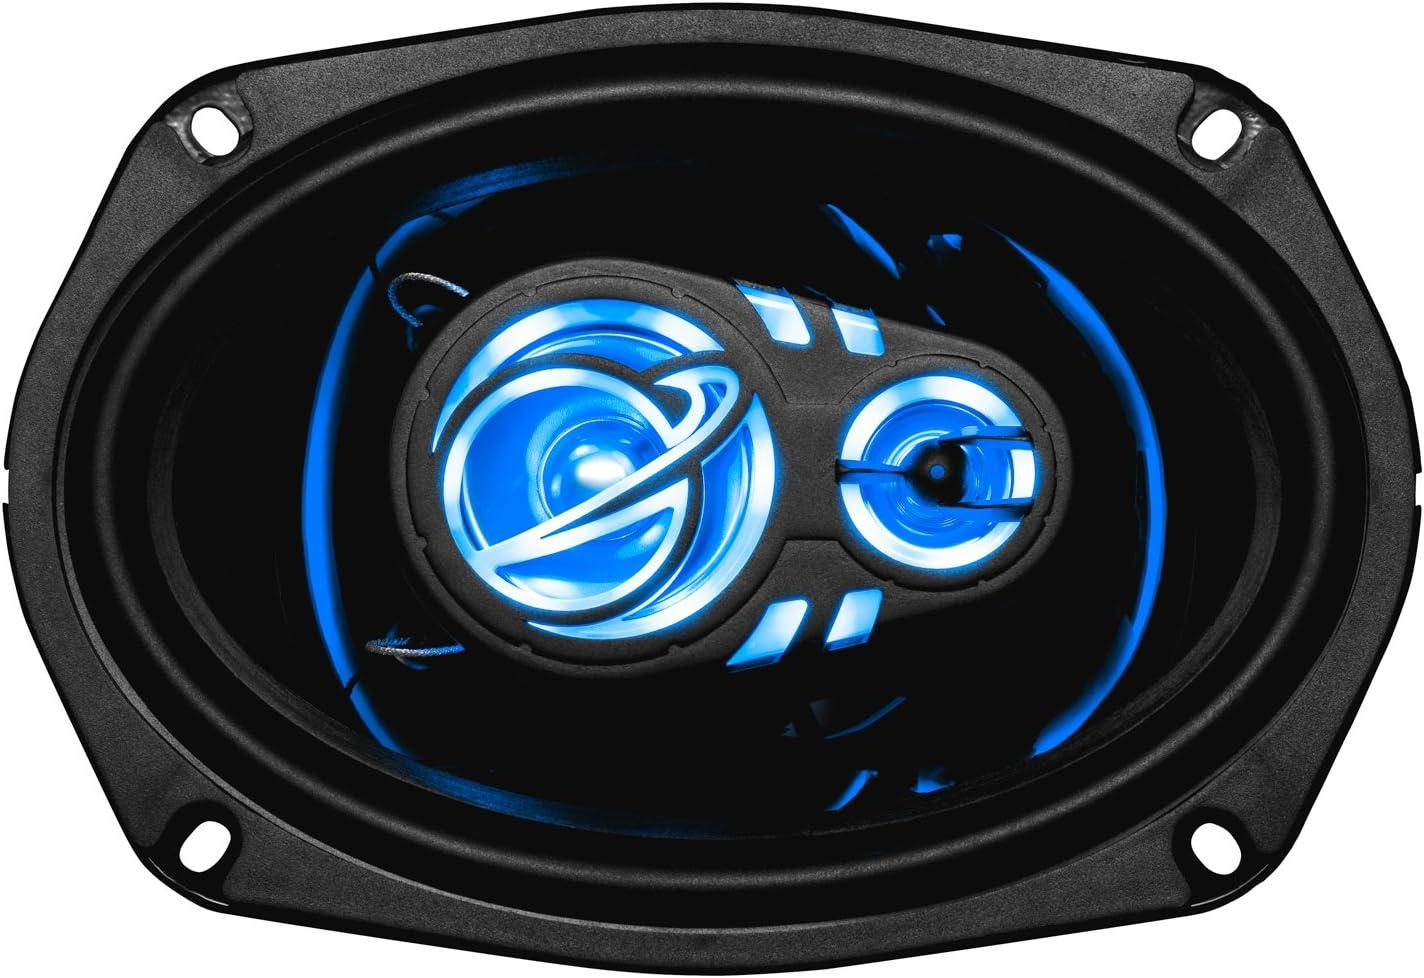 Planet Audio AC693 6 x 9 Inch Car Speakers - 500 Watts of Power Per Pair, 250 Watts Each, Full Range, 3 Way, Sold in Pairs